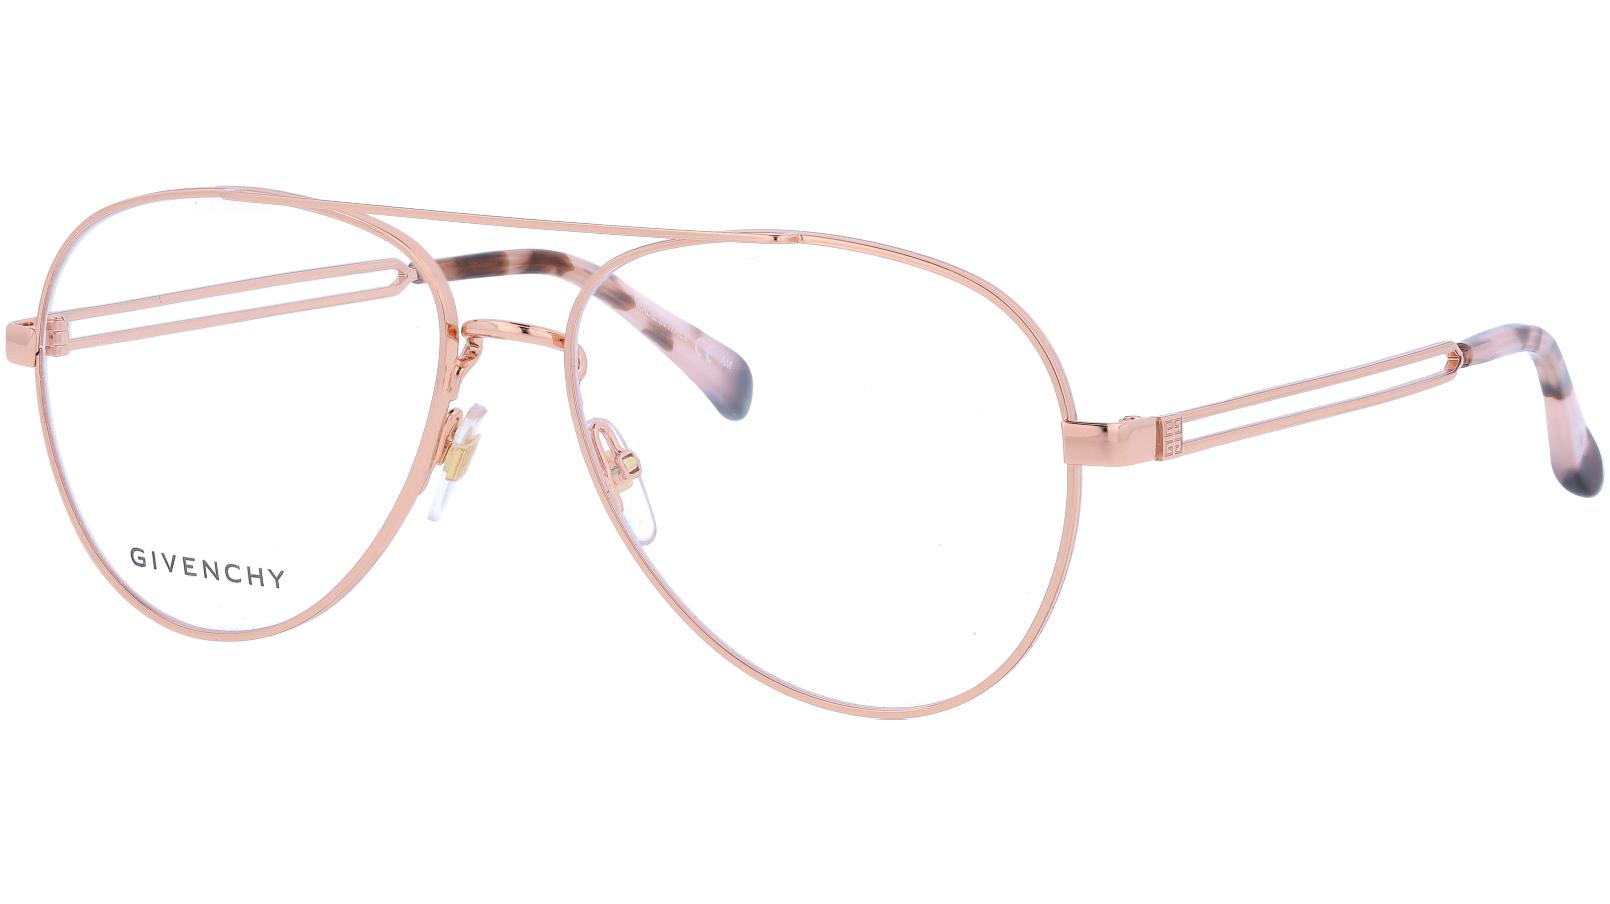 Givenchy GV0095 DDB 56 Gold Glasses